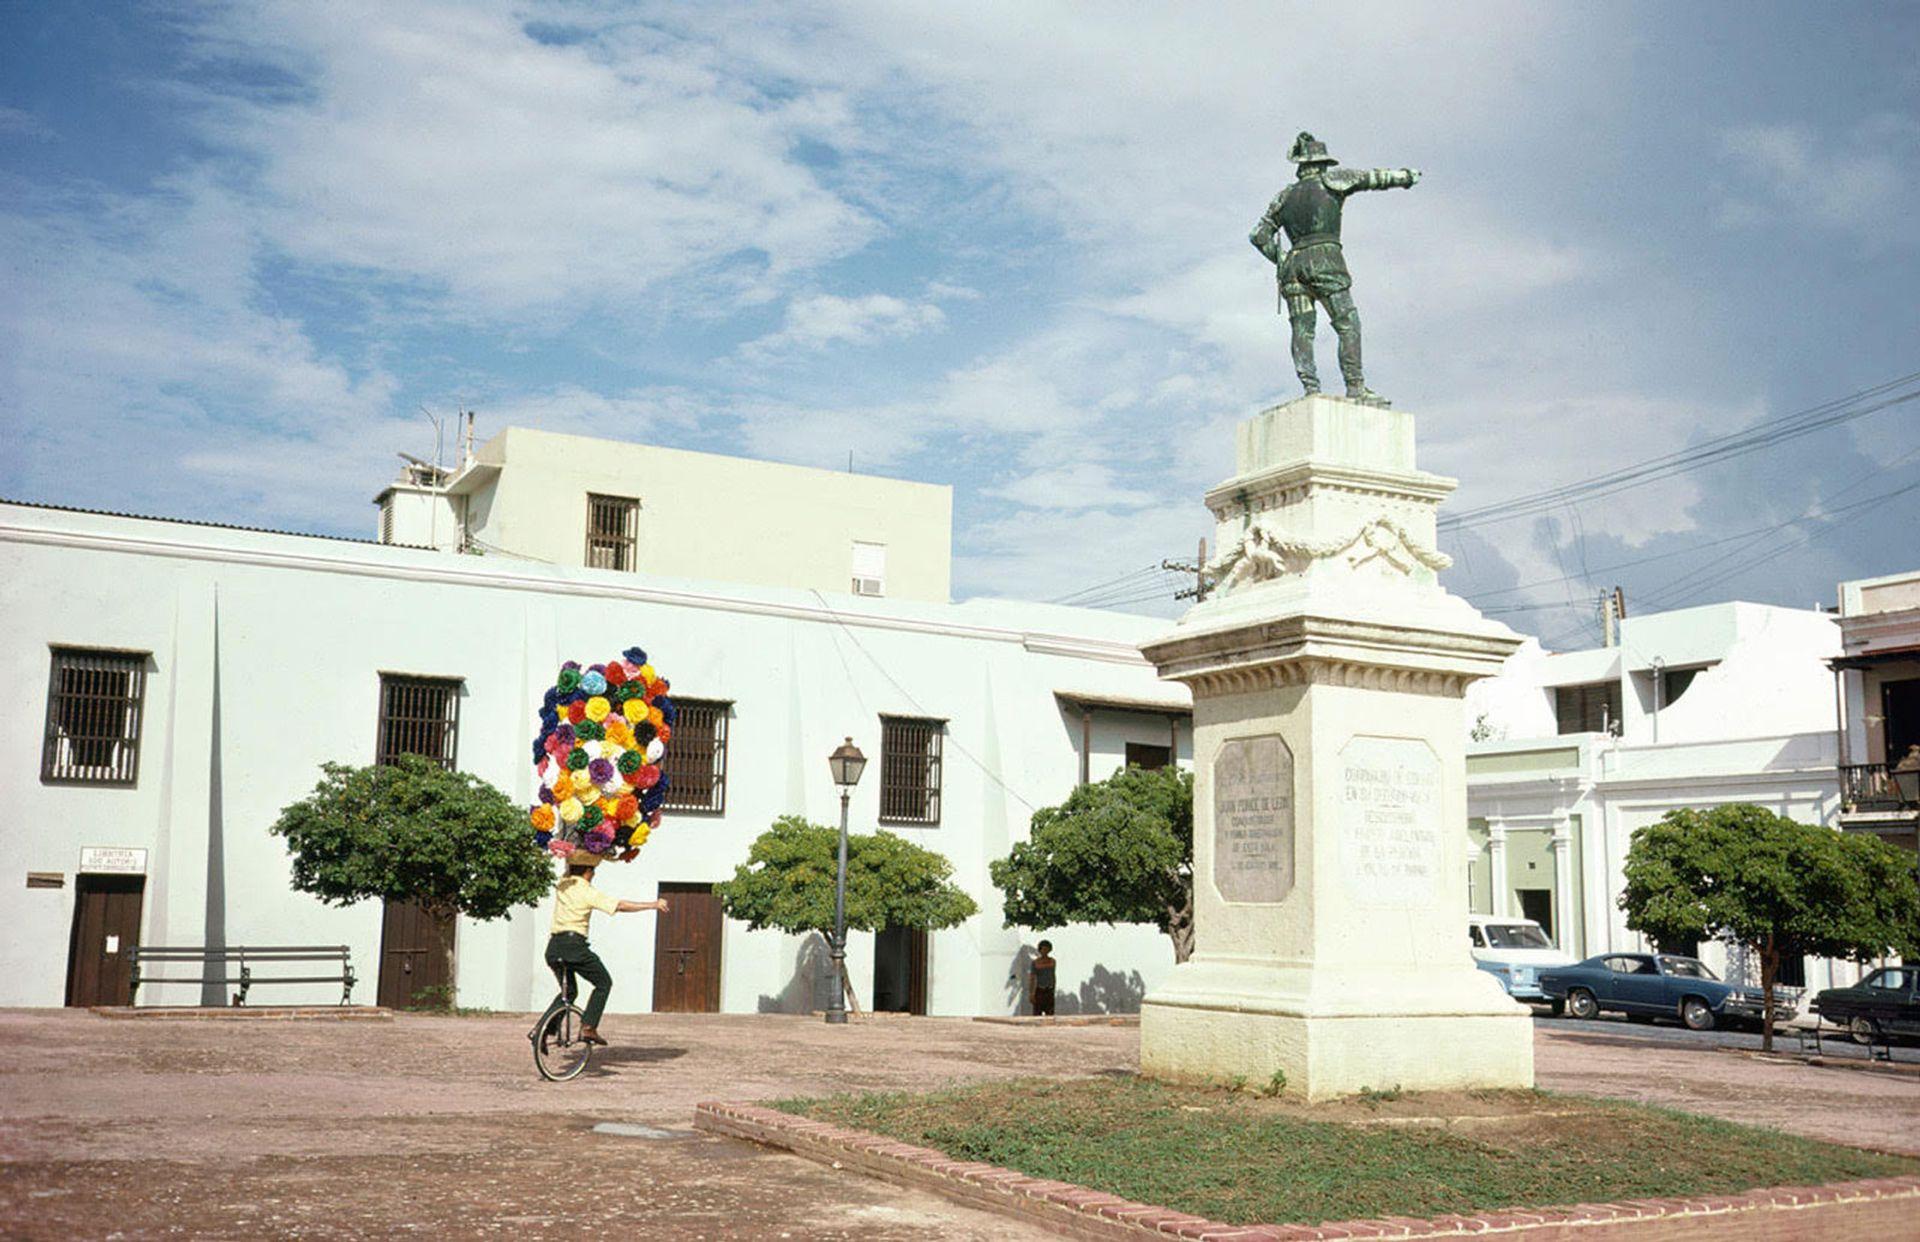 San Juan, Puerto Rico (1974) features in a new Joel Meyerowitz book called Wild Flowers